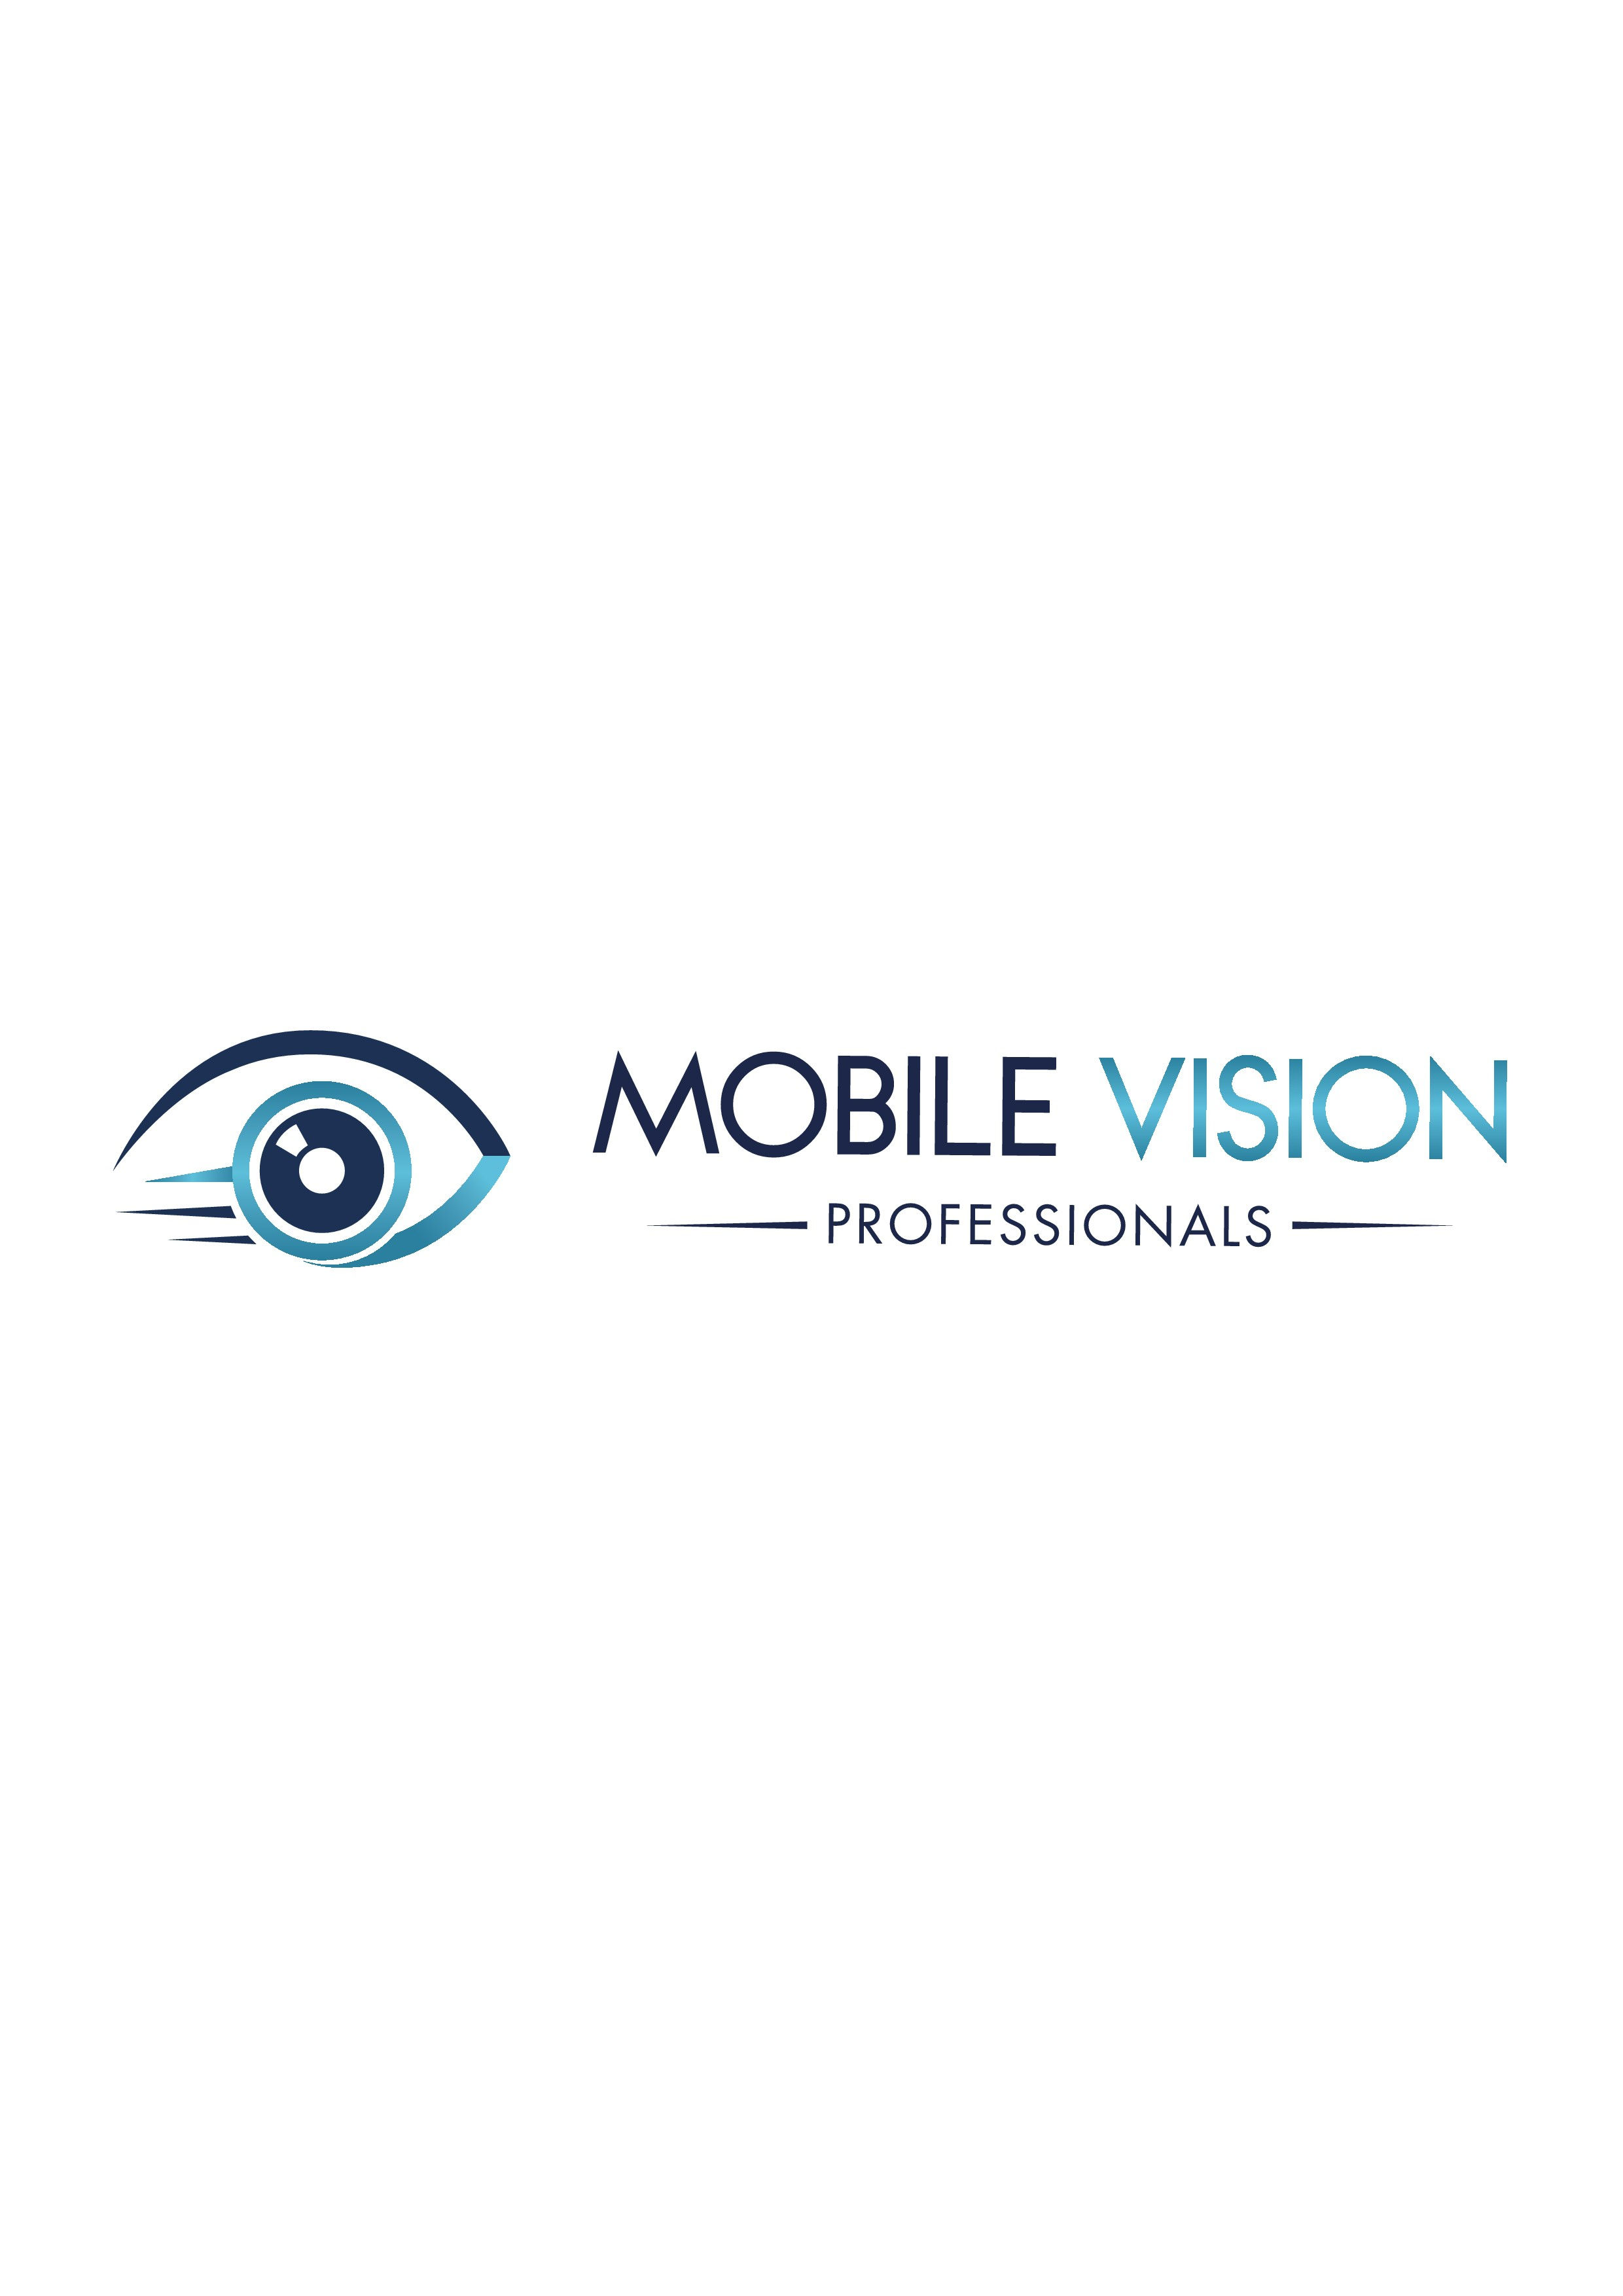 Create a logo and design concept for a mobile eye care practice.